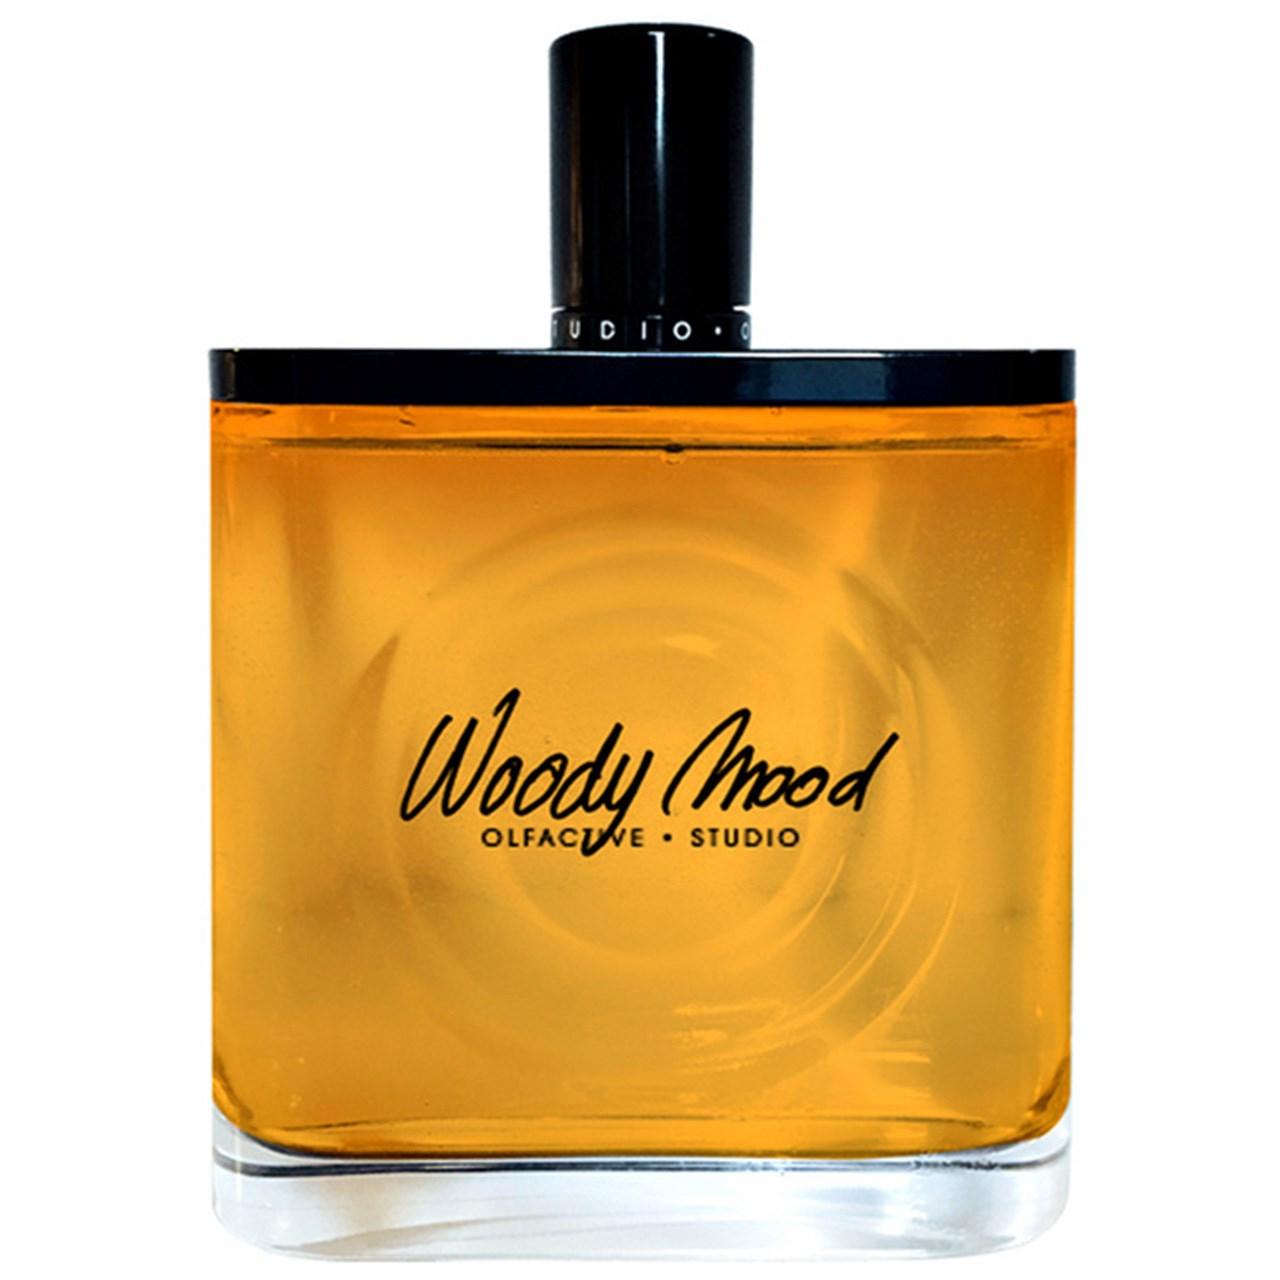 ادو پرفیوم الفکتیو استودیو مدل Woody Mood حجم 100 میلی لیتر